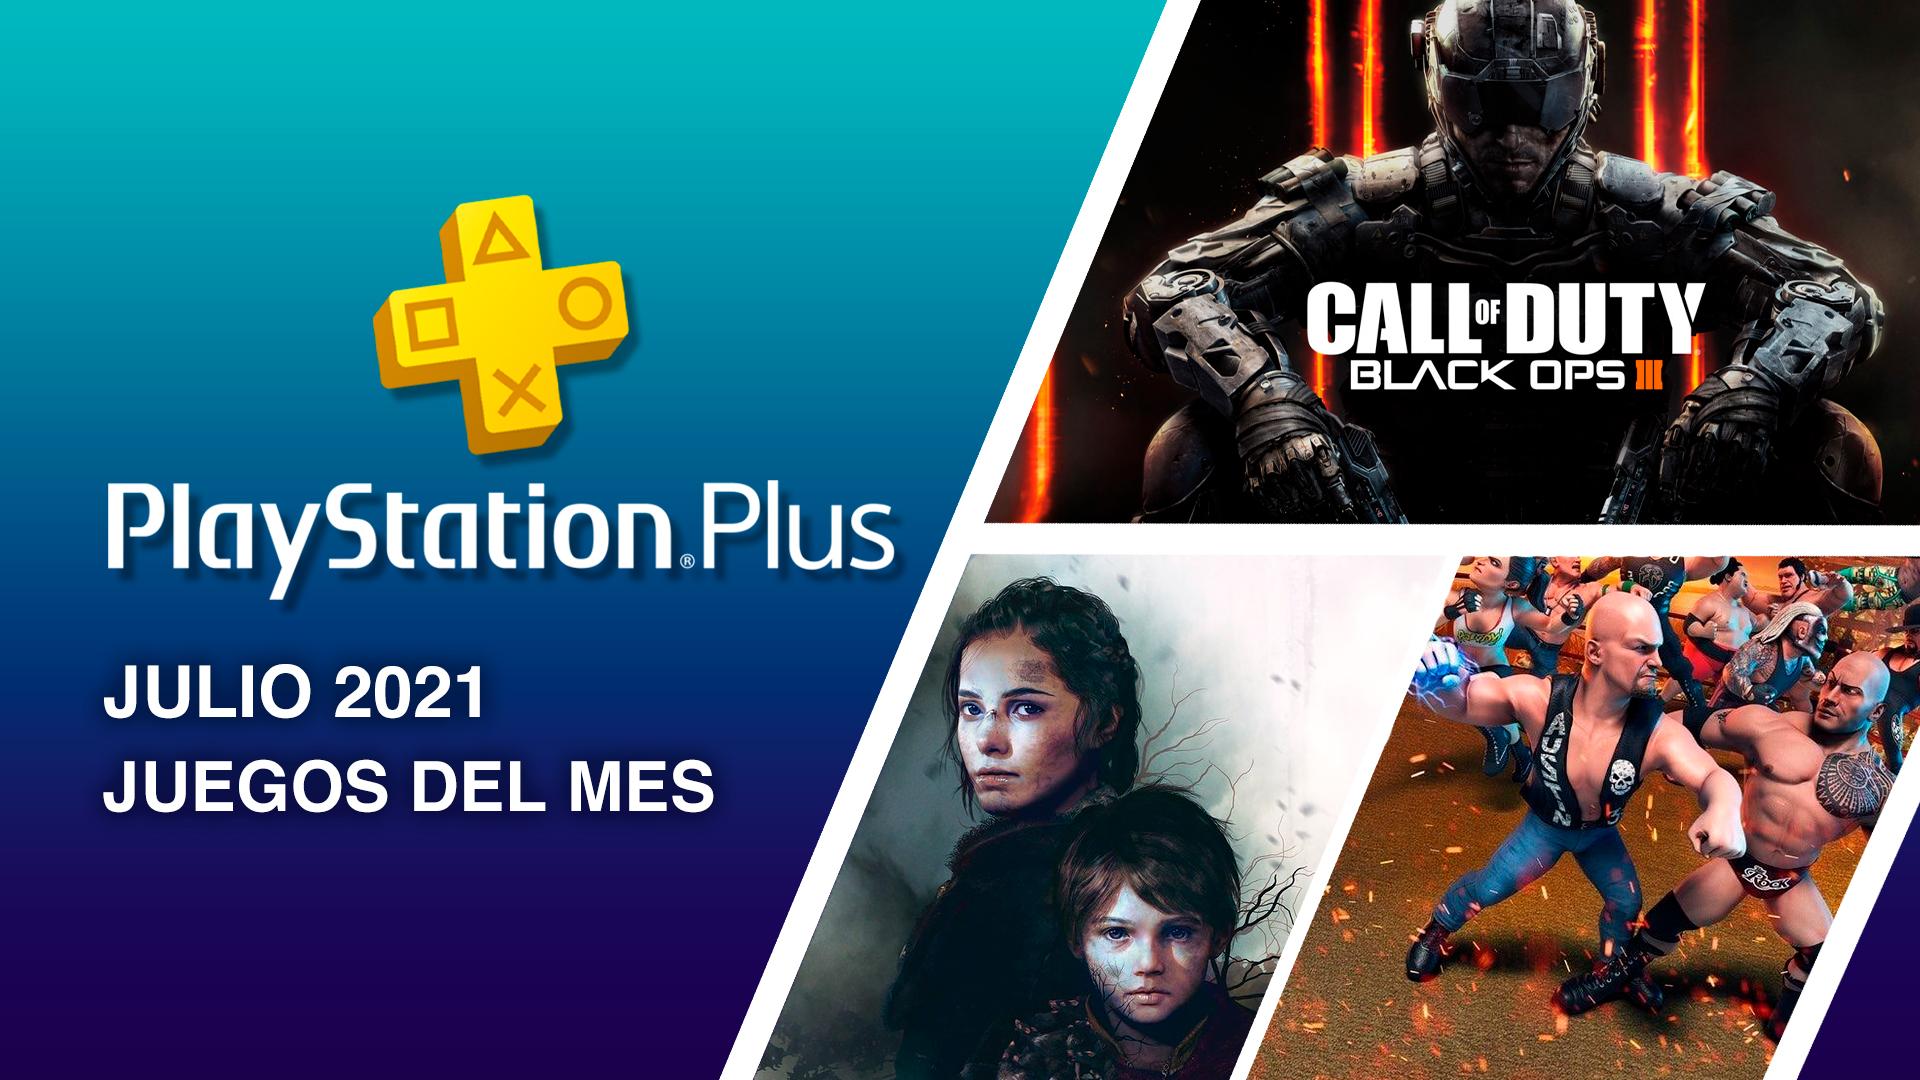 PlayStation Plus Julio 2021